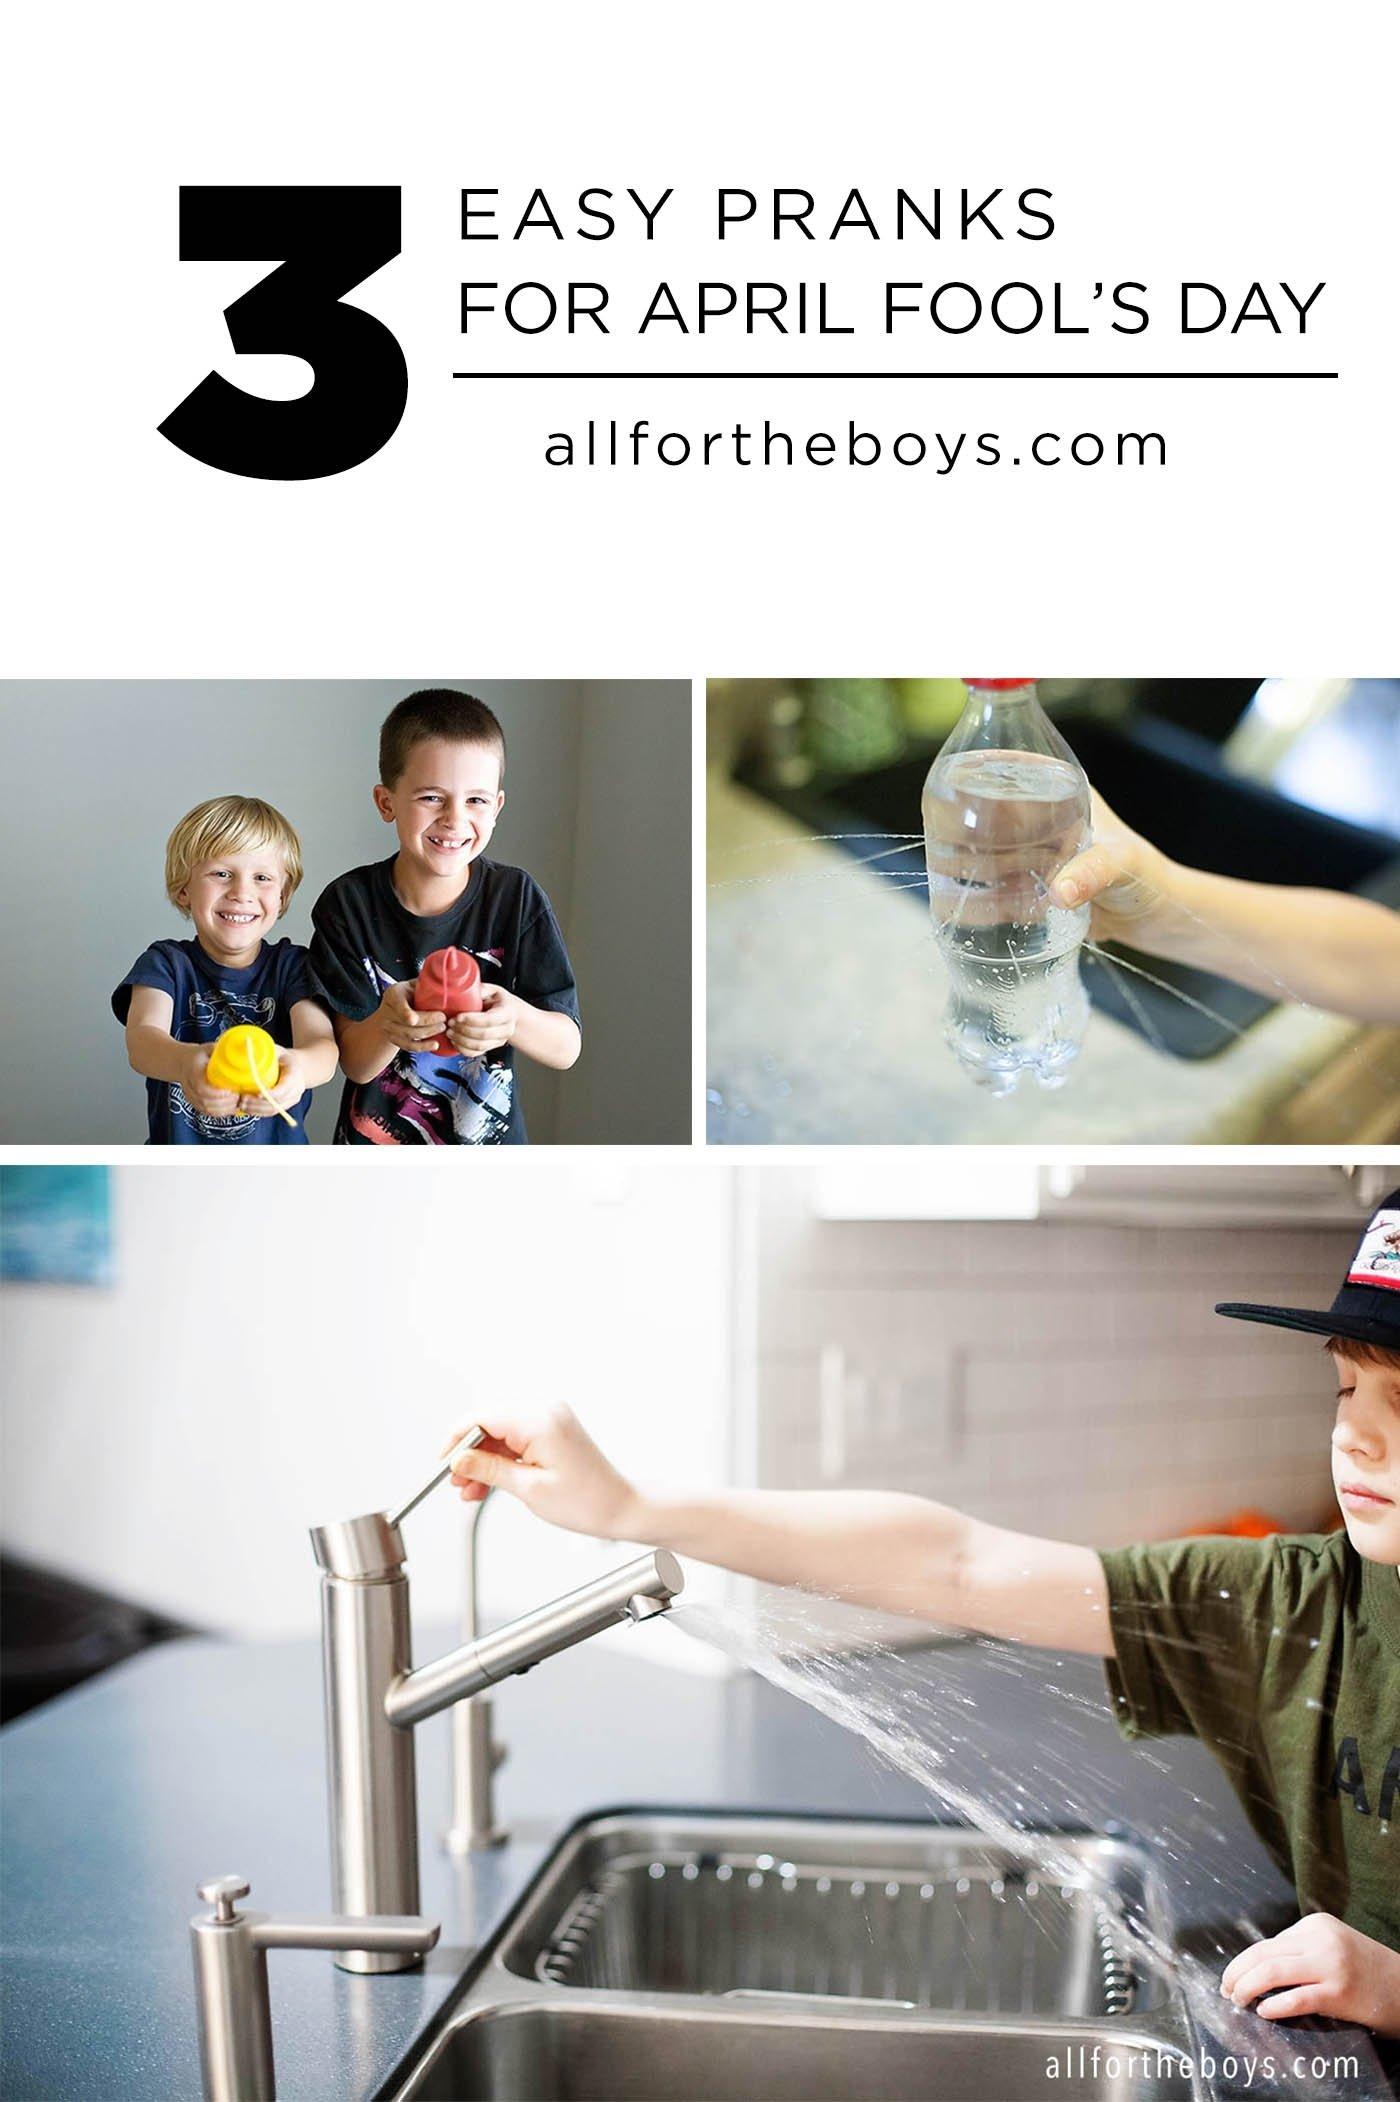 10 Most Popular Good Ideas For April Fools Day 3 easy pranks for april fools day all for the boys